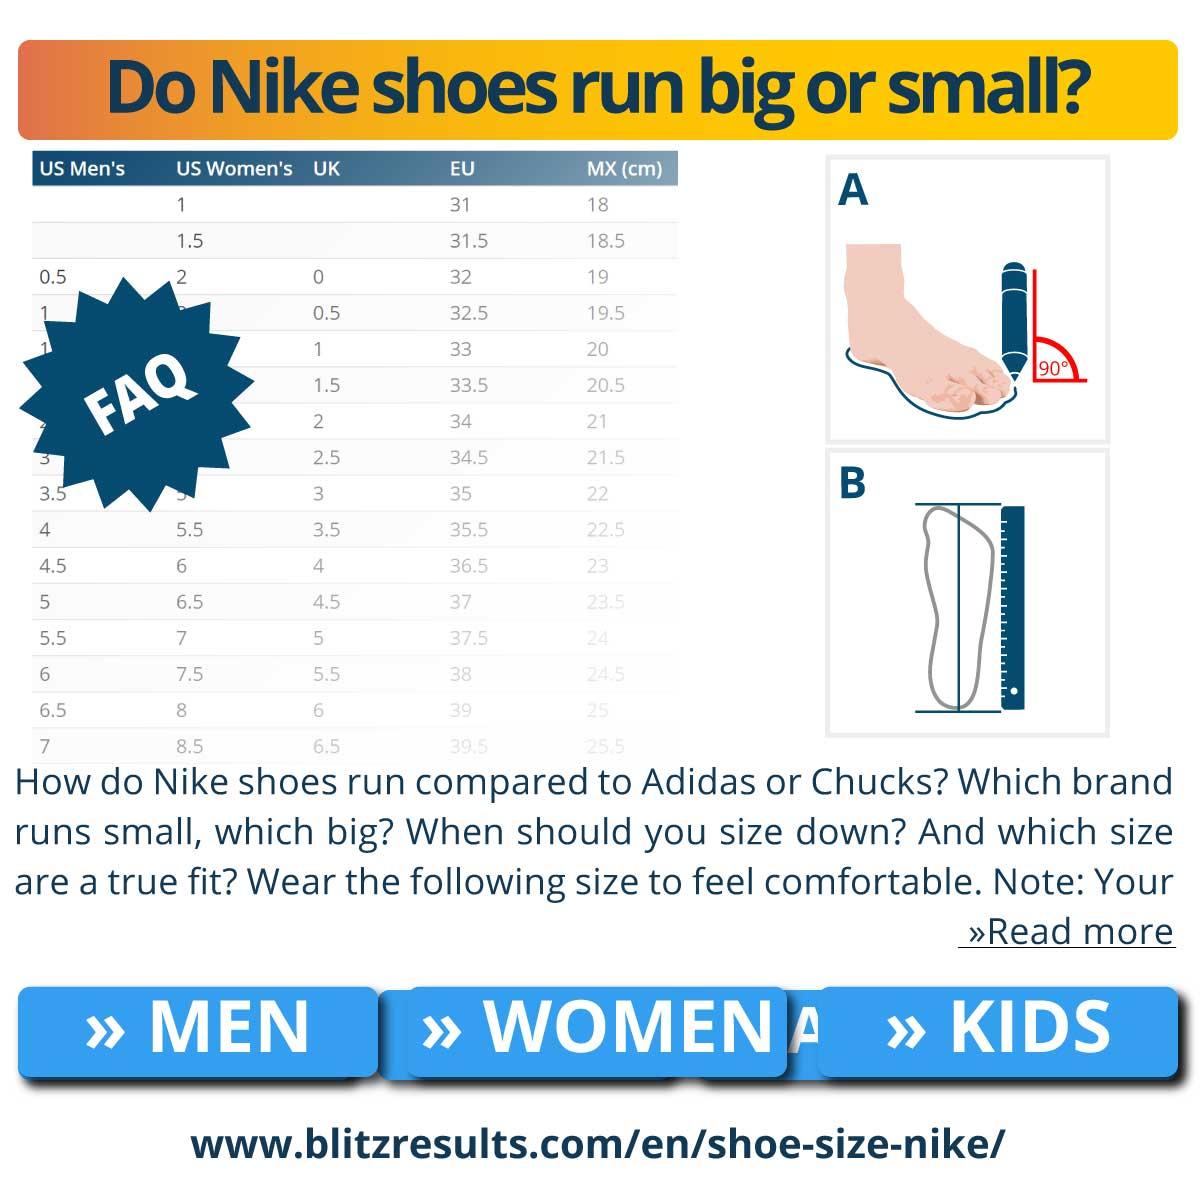 Do Nike shoes run big or small?